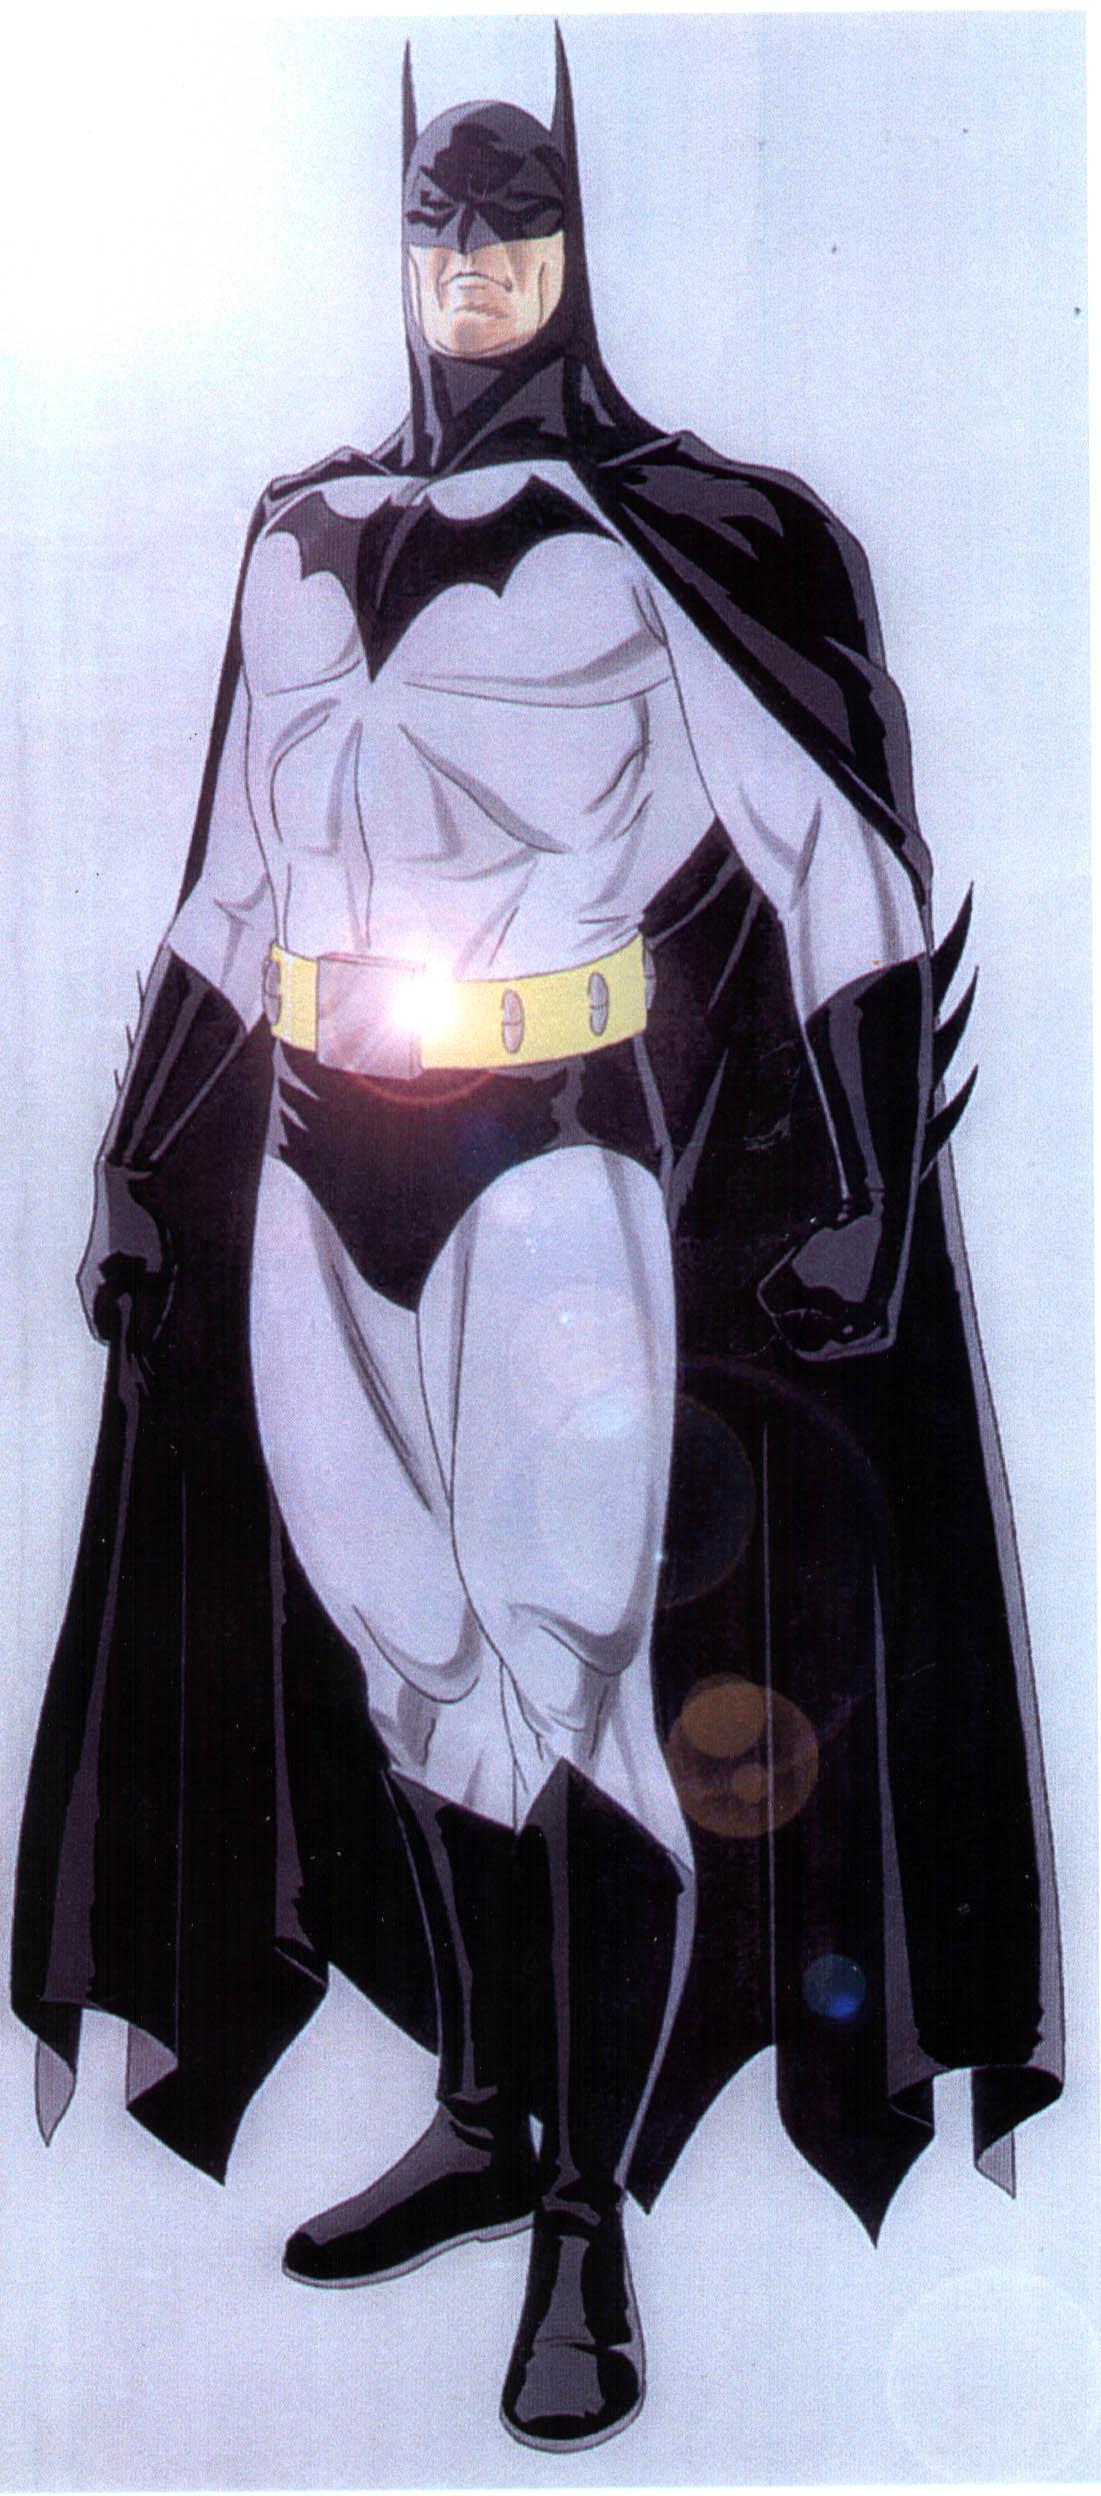 Bats by BroHawk